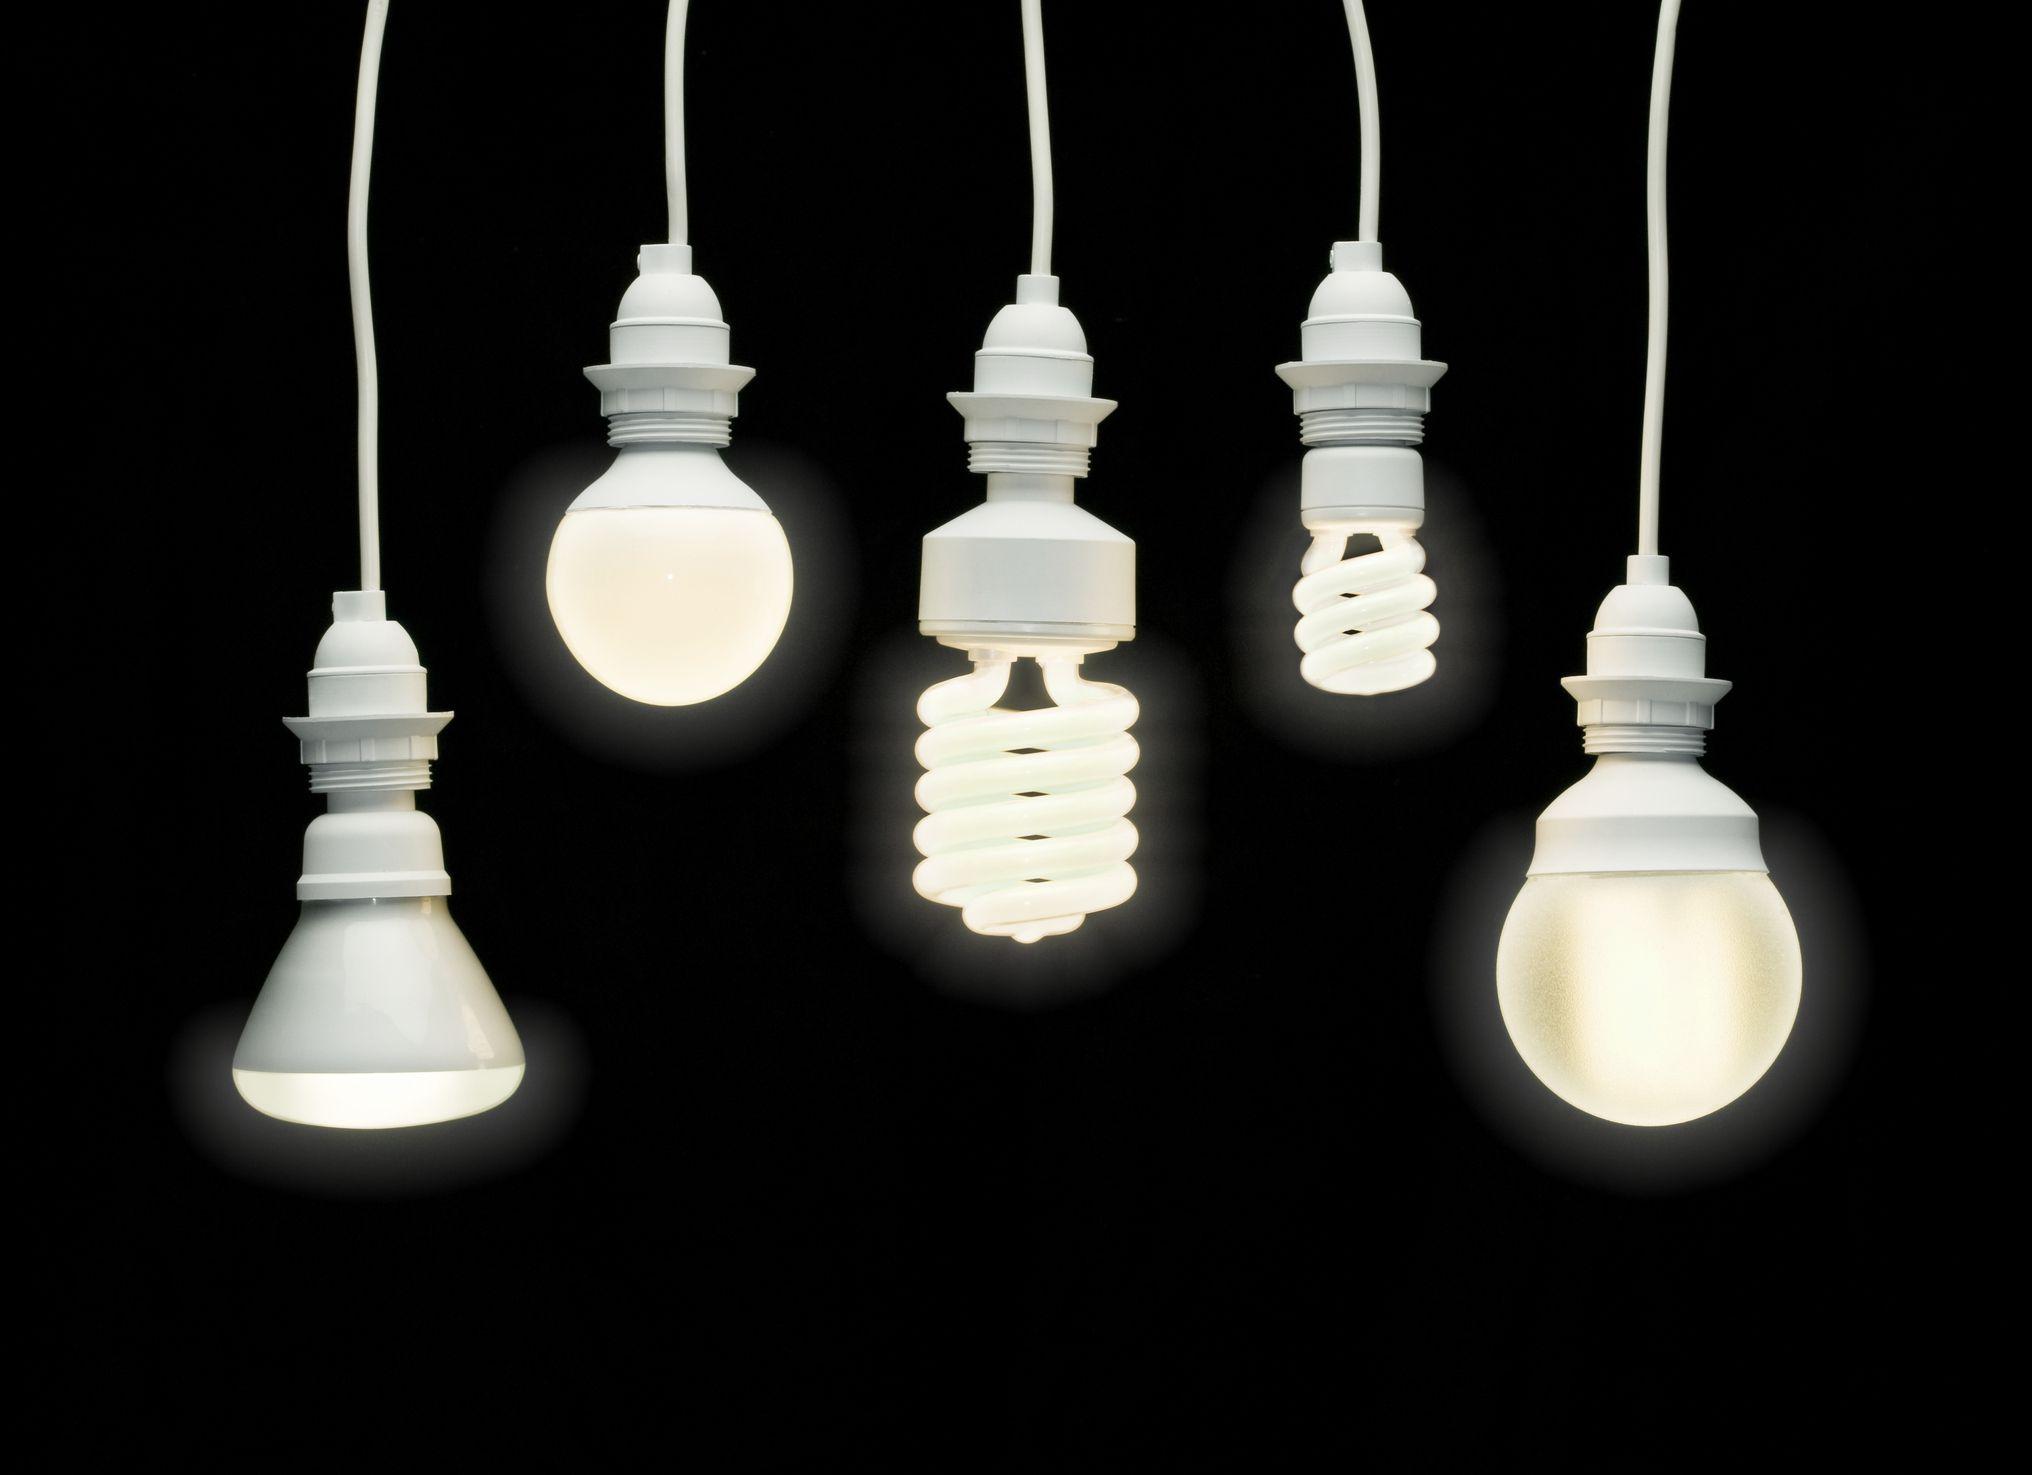 Landscaping Light Bulbs